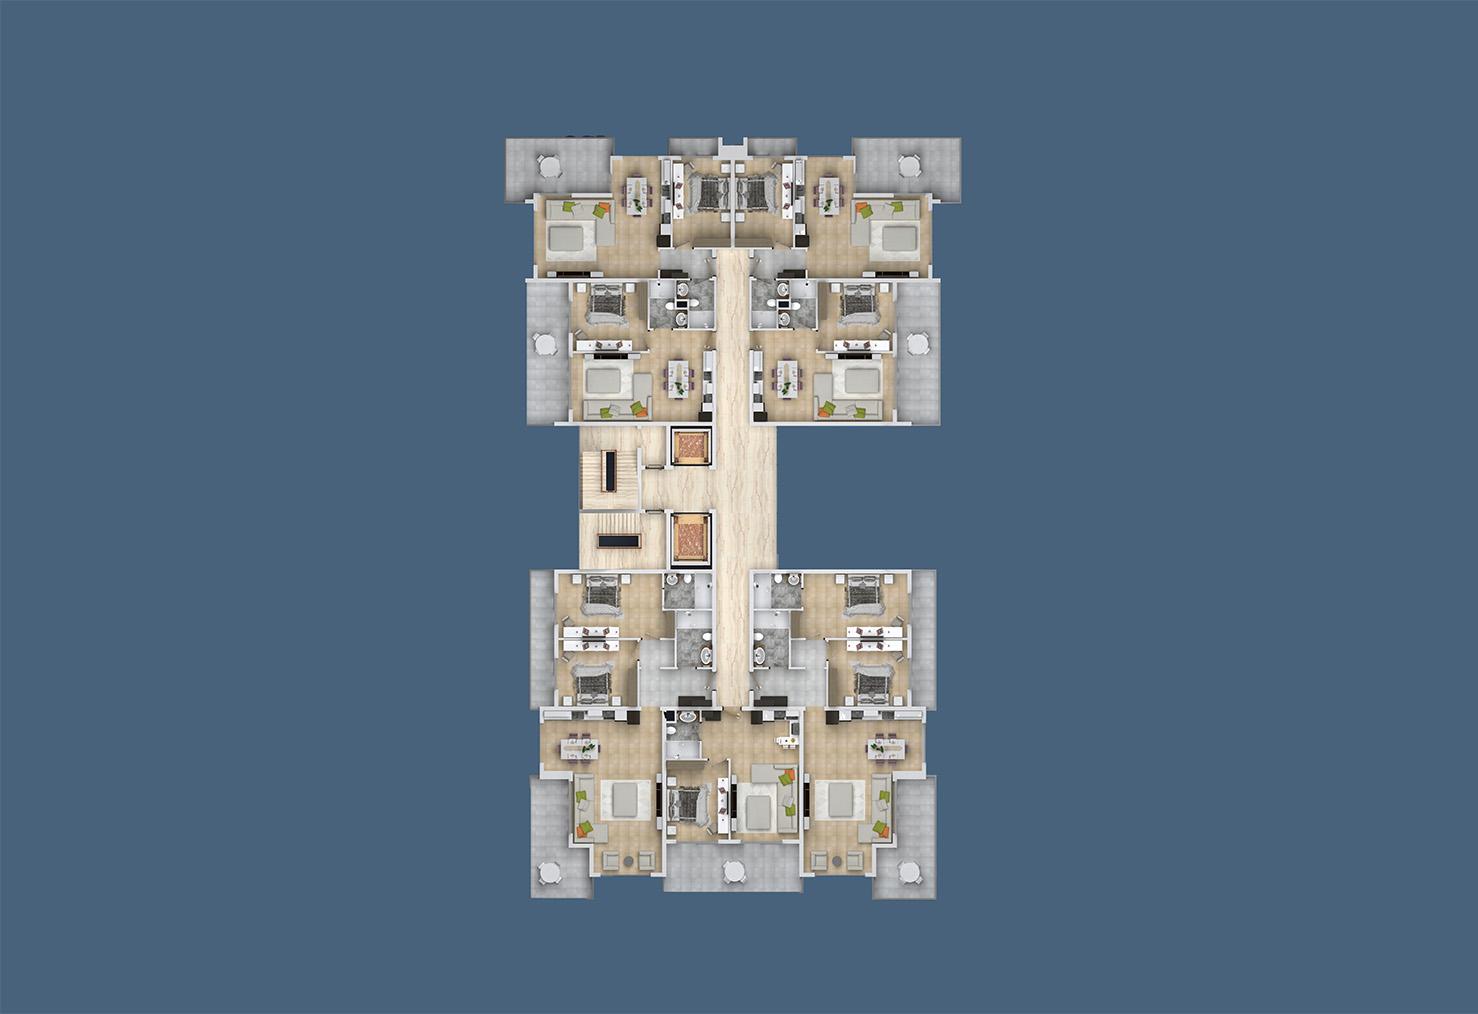 План расположения квартир 3 этаж «B» Yekta Kingdom Trade Center